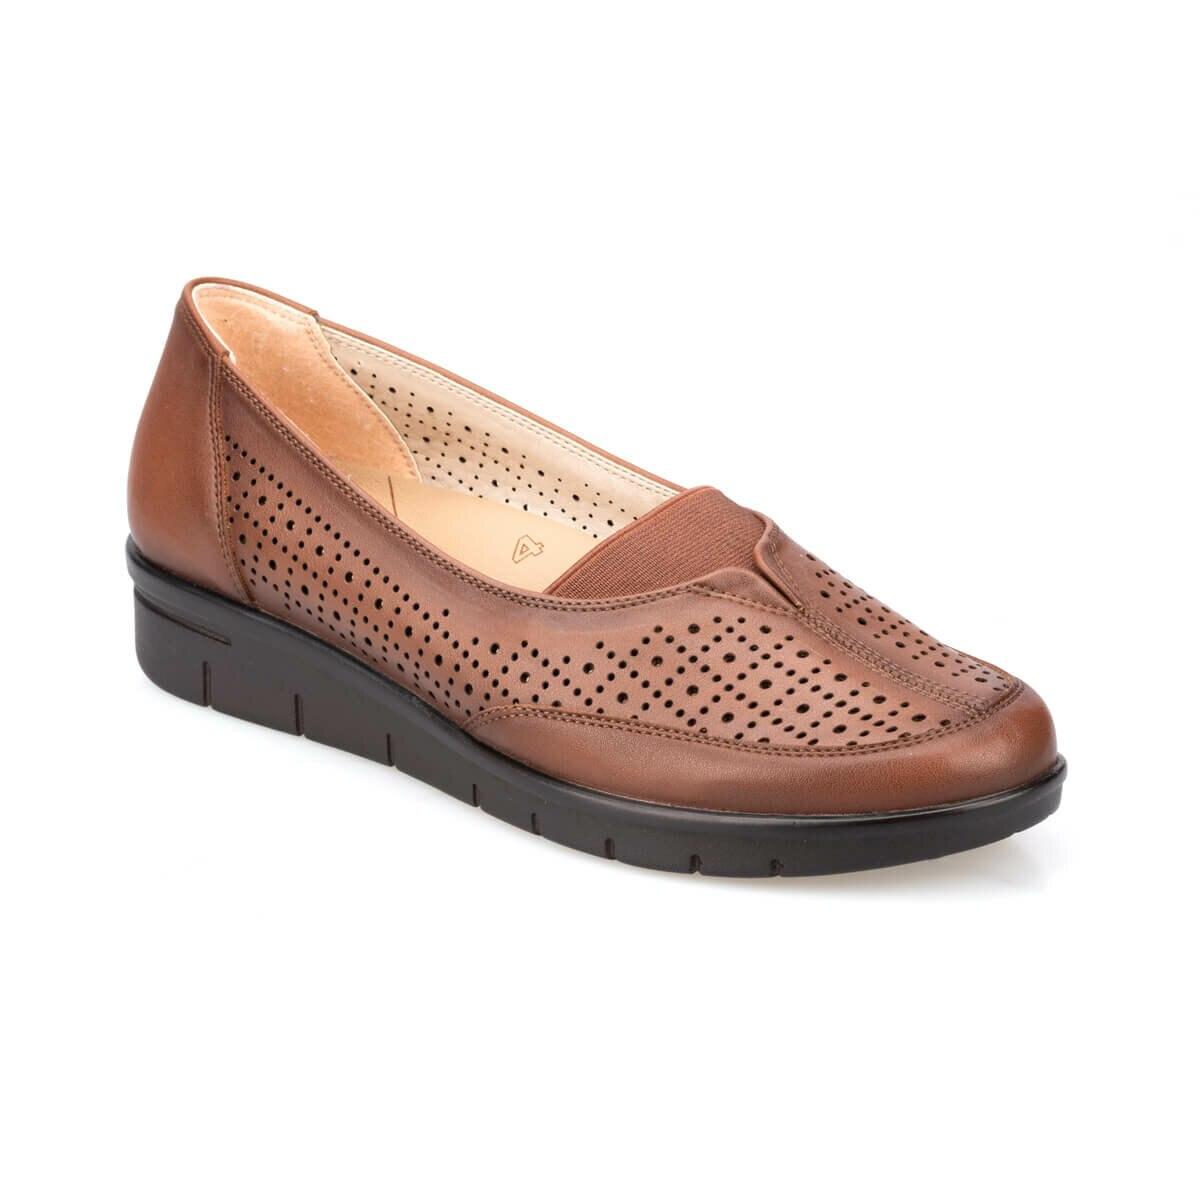 FLO 91. 100679.Z Tan Women 'S Shoes Polaris 5 Point